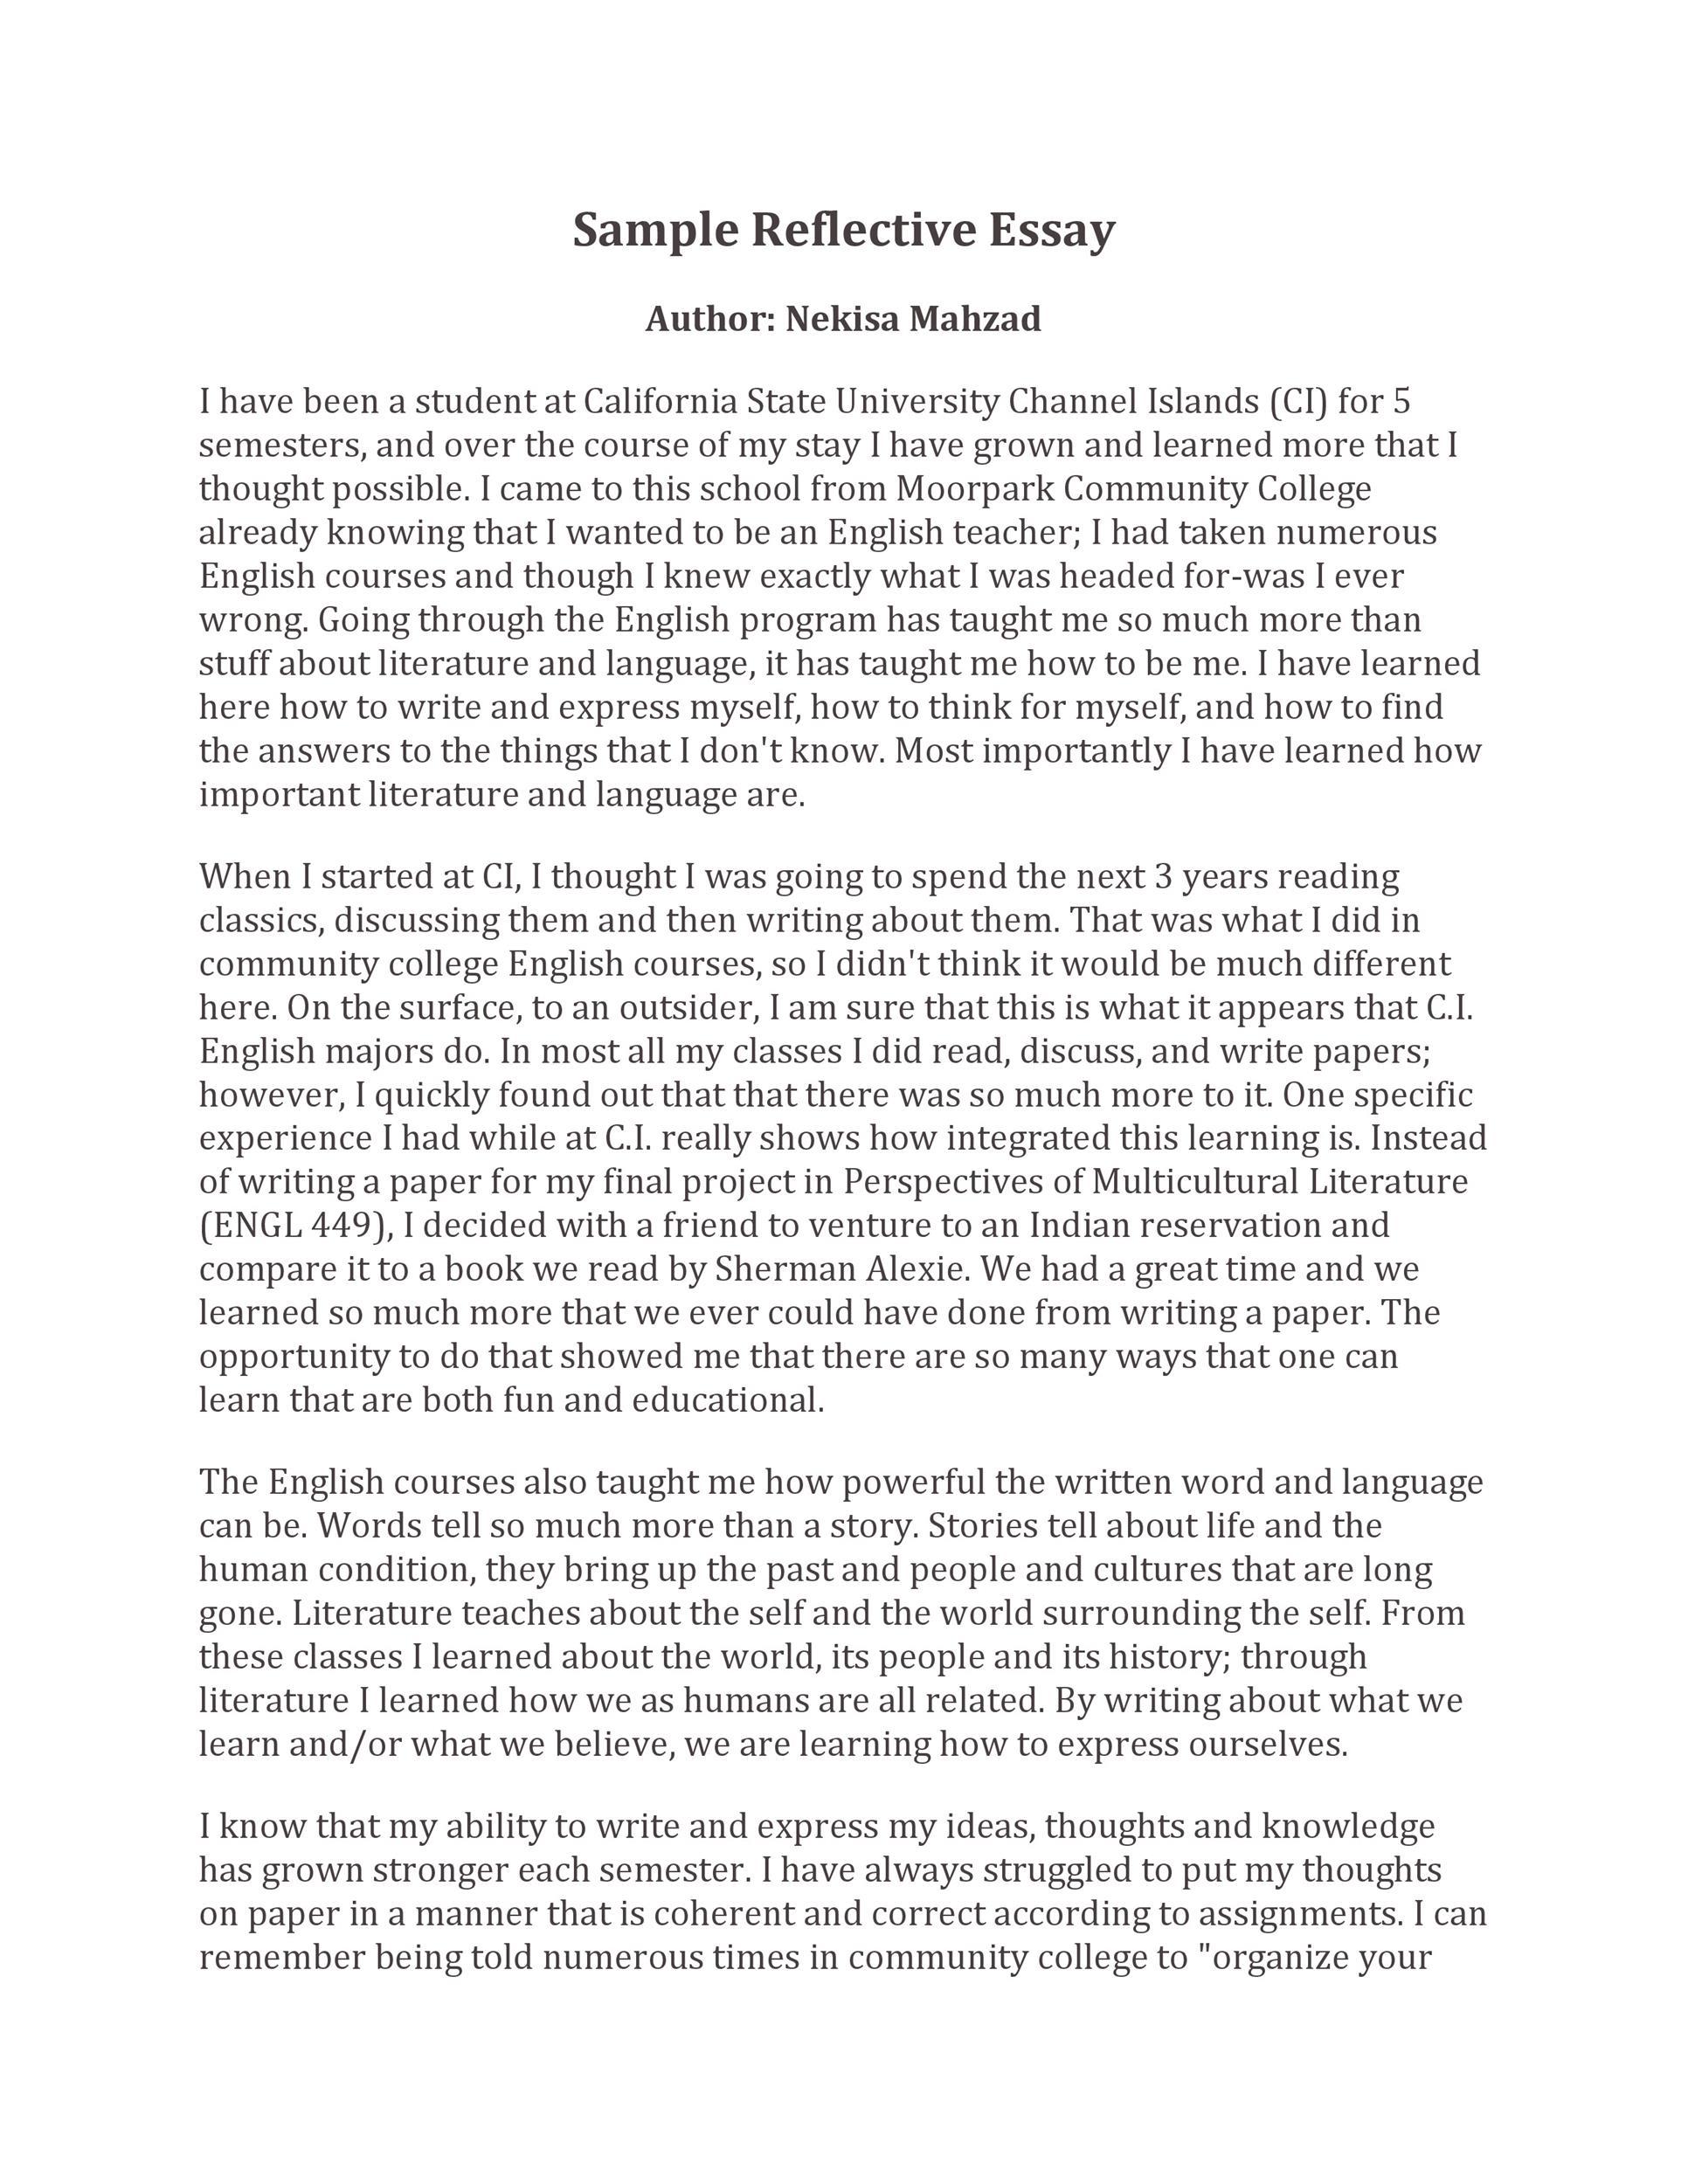 Free reflective essay example 45